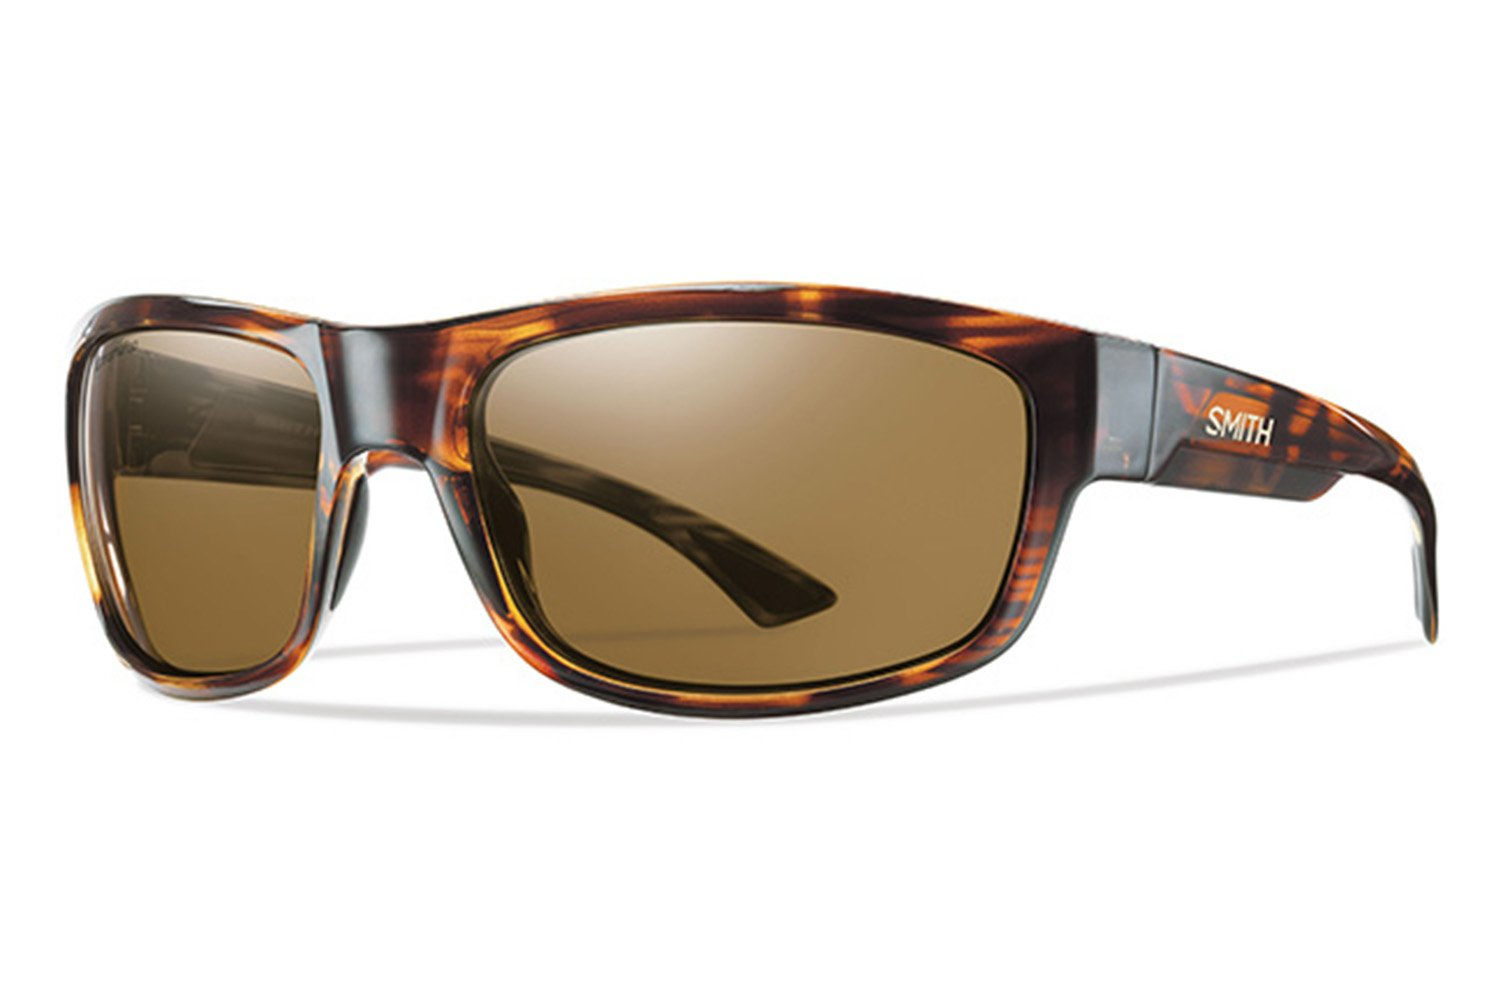 Smith Dover Sunglasses by Smith Optics